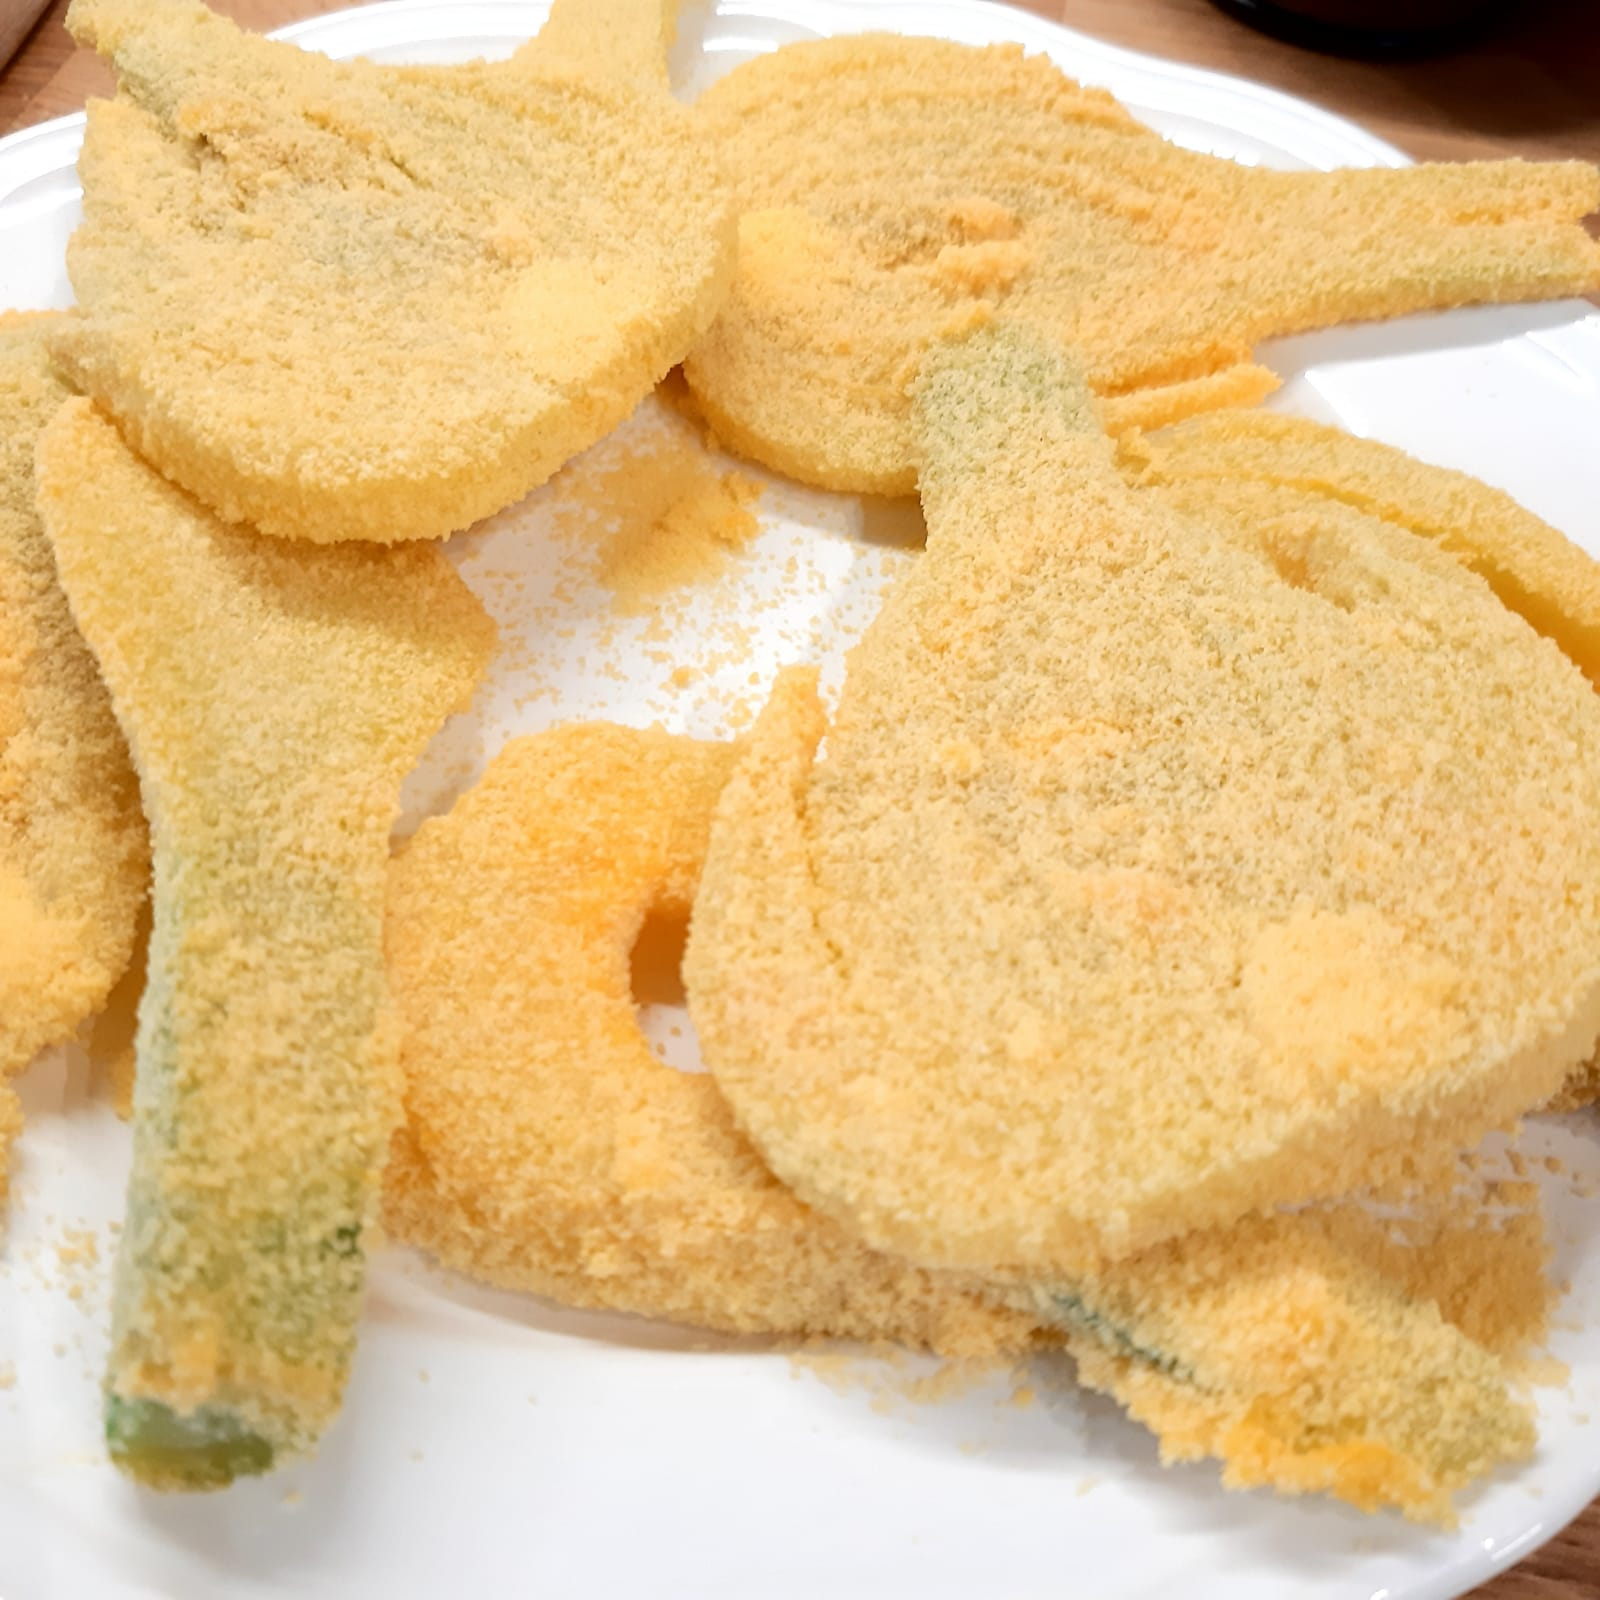 finocchi fritti panati